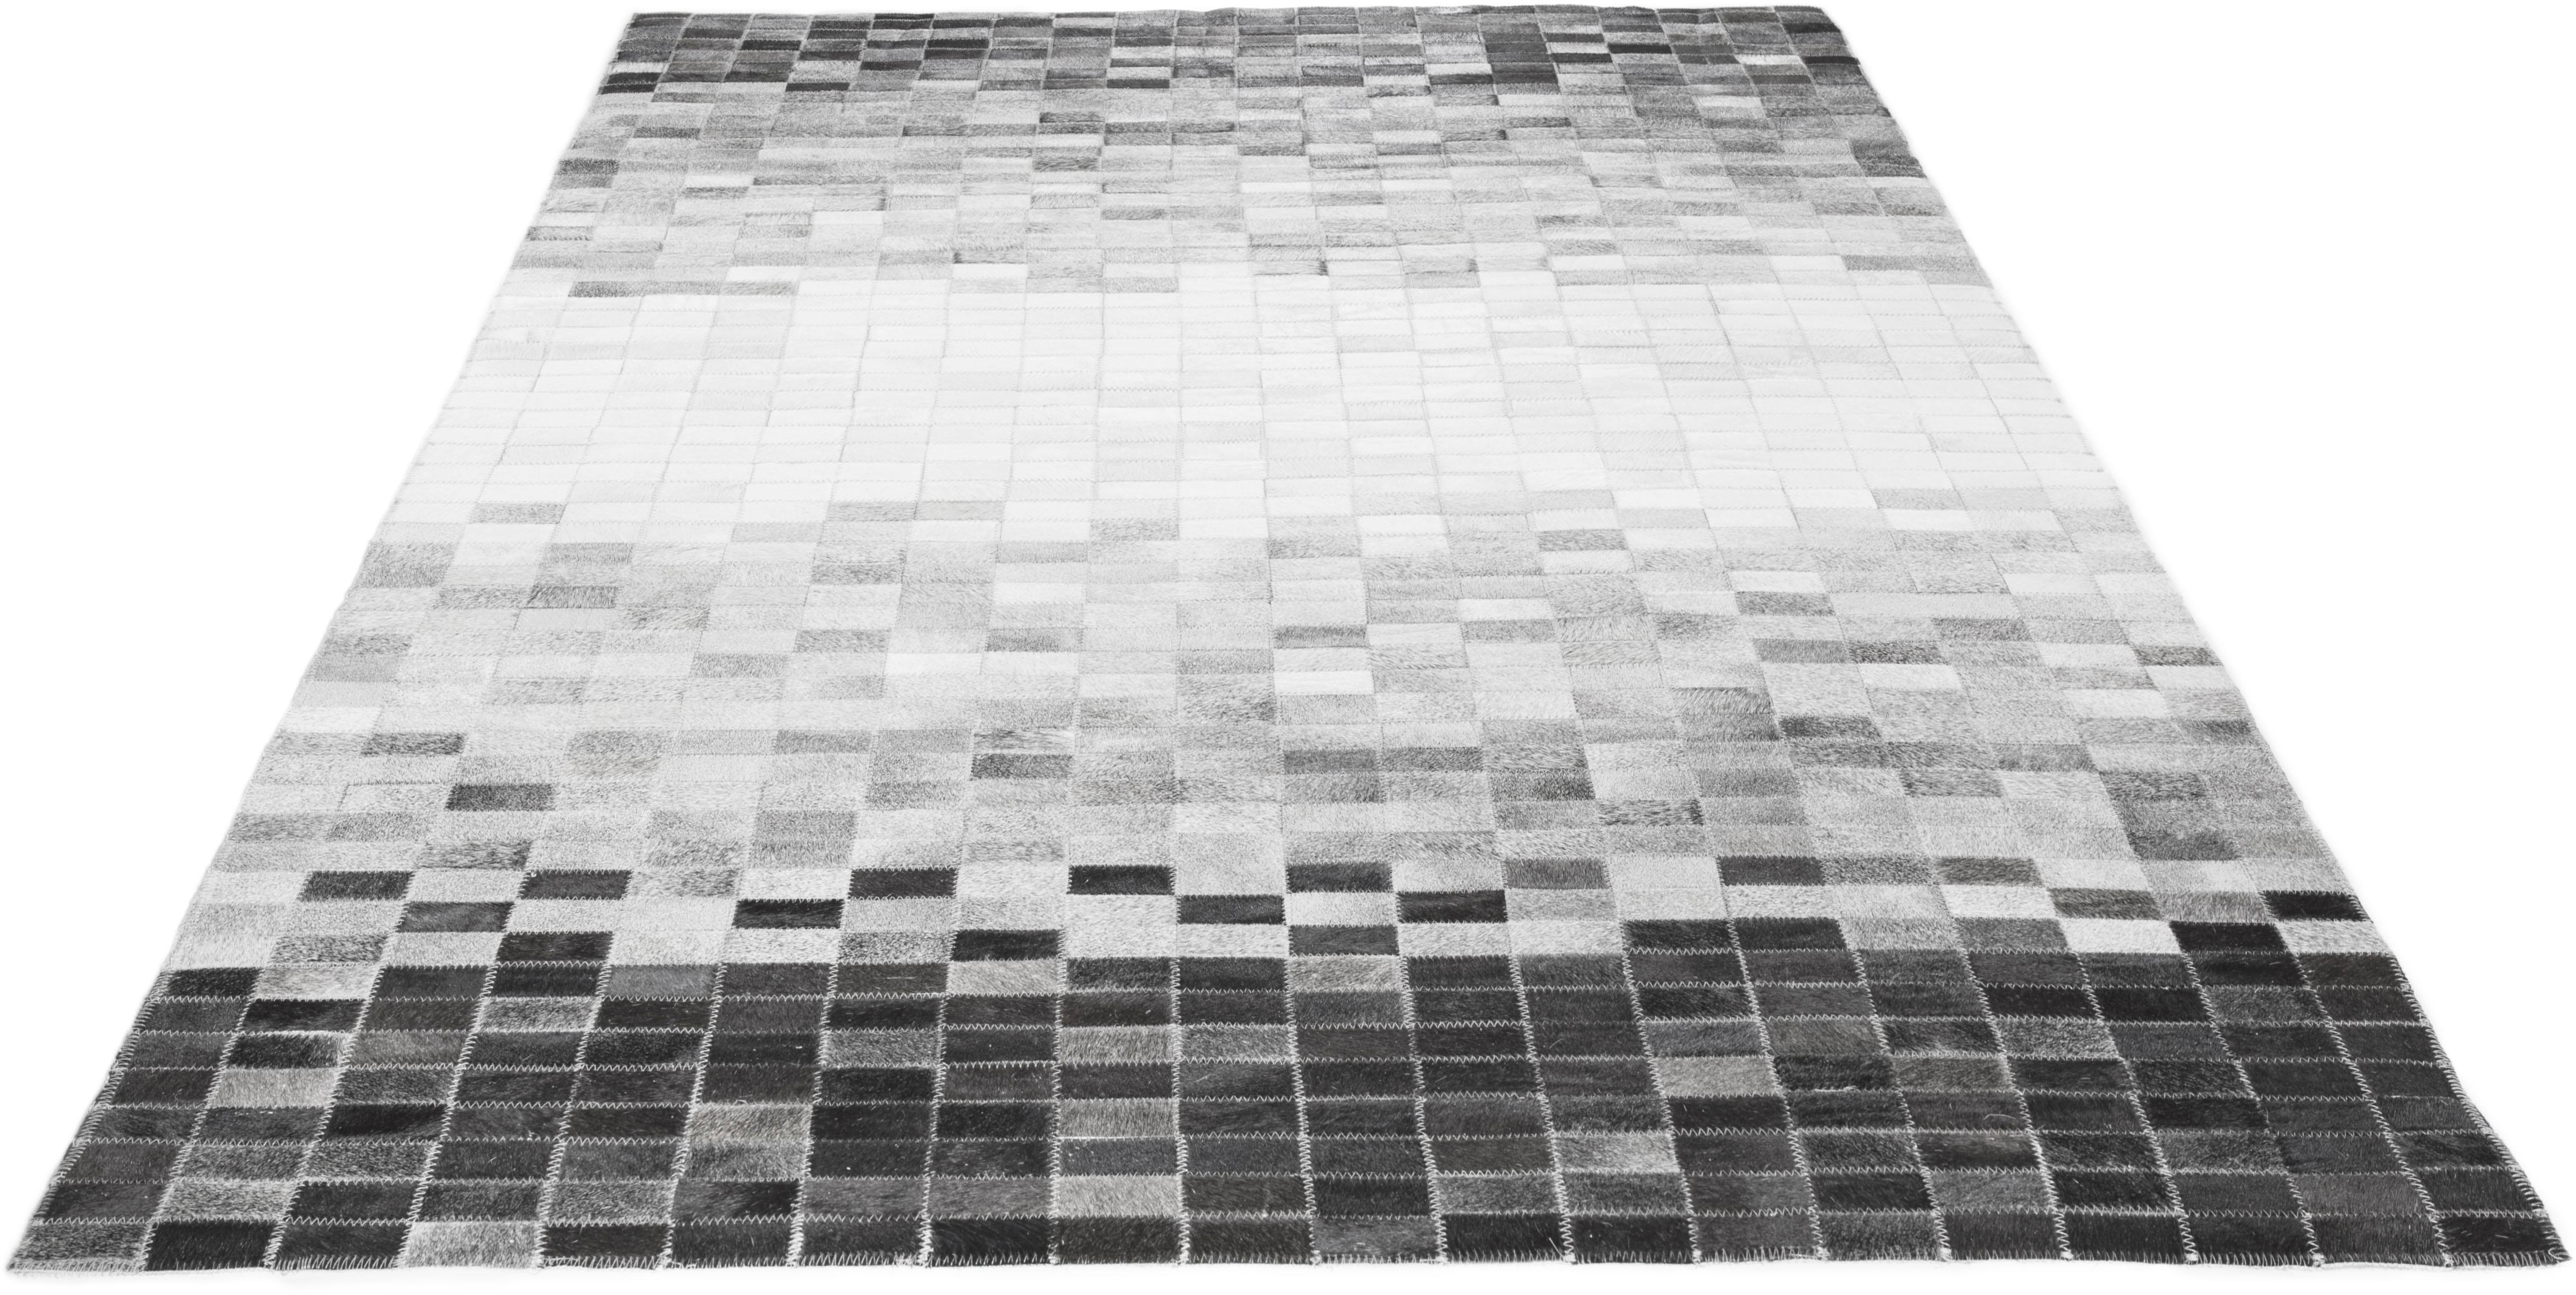 Fellteppich Porto Allegre LUXOR living rechteckig Höhe 4 mm Naturprodukt